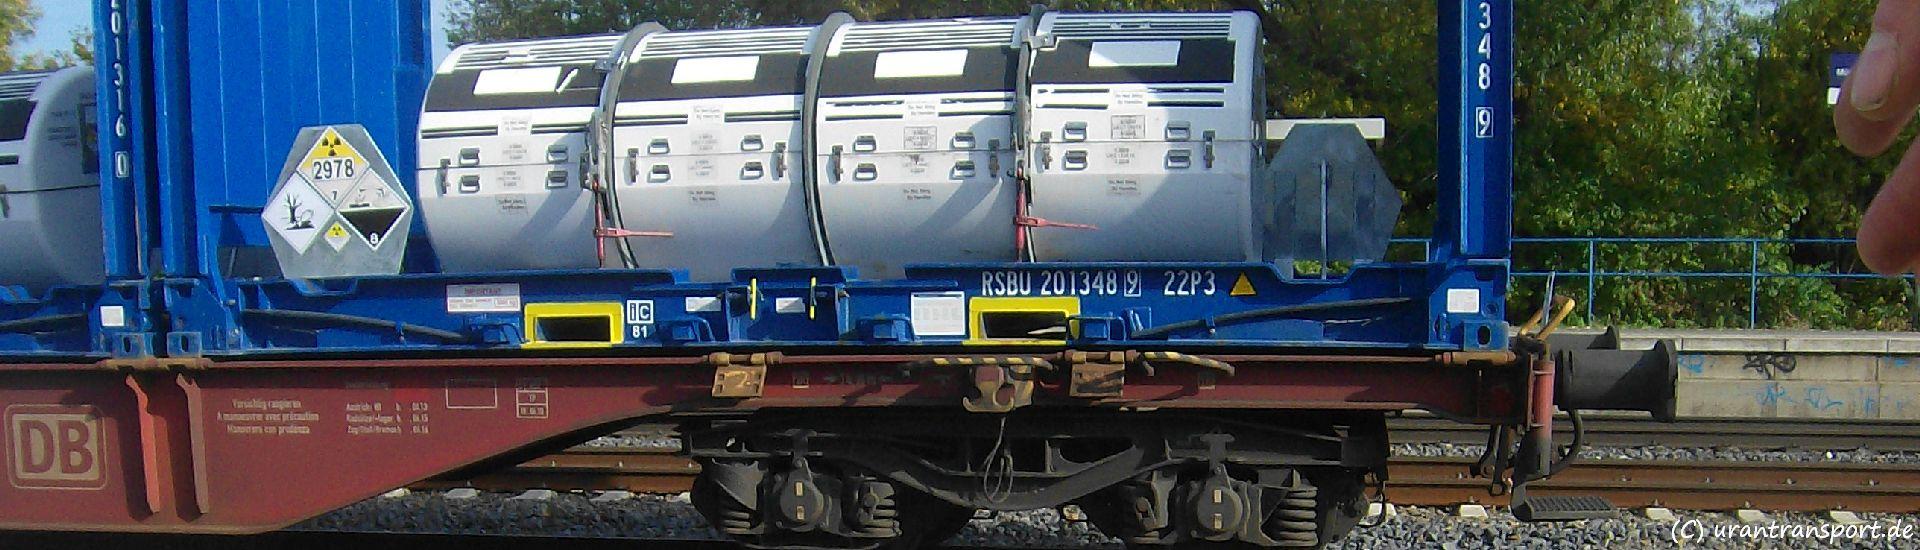 18.11.2019: Protest gegen Uranmülltransport